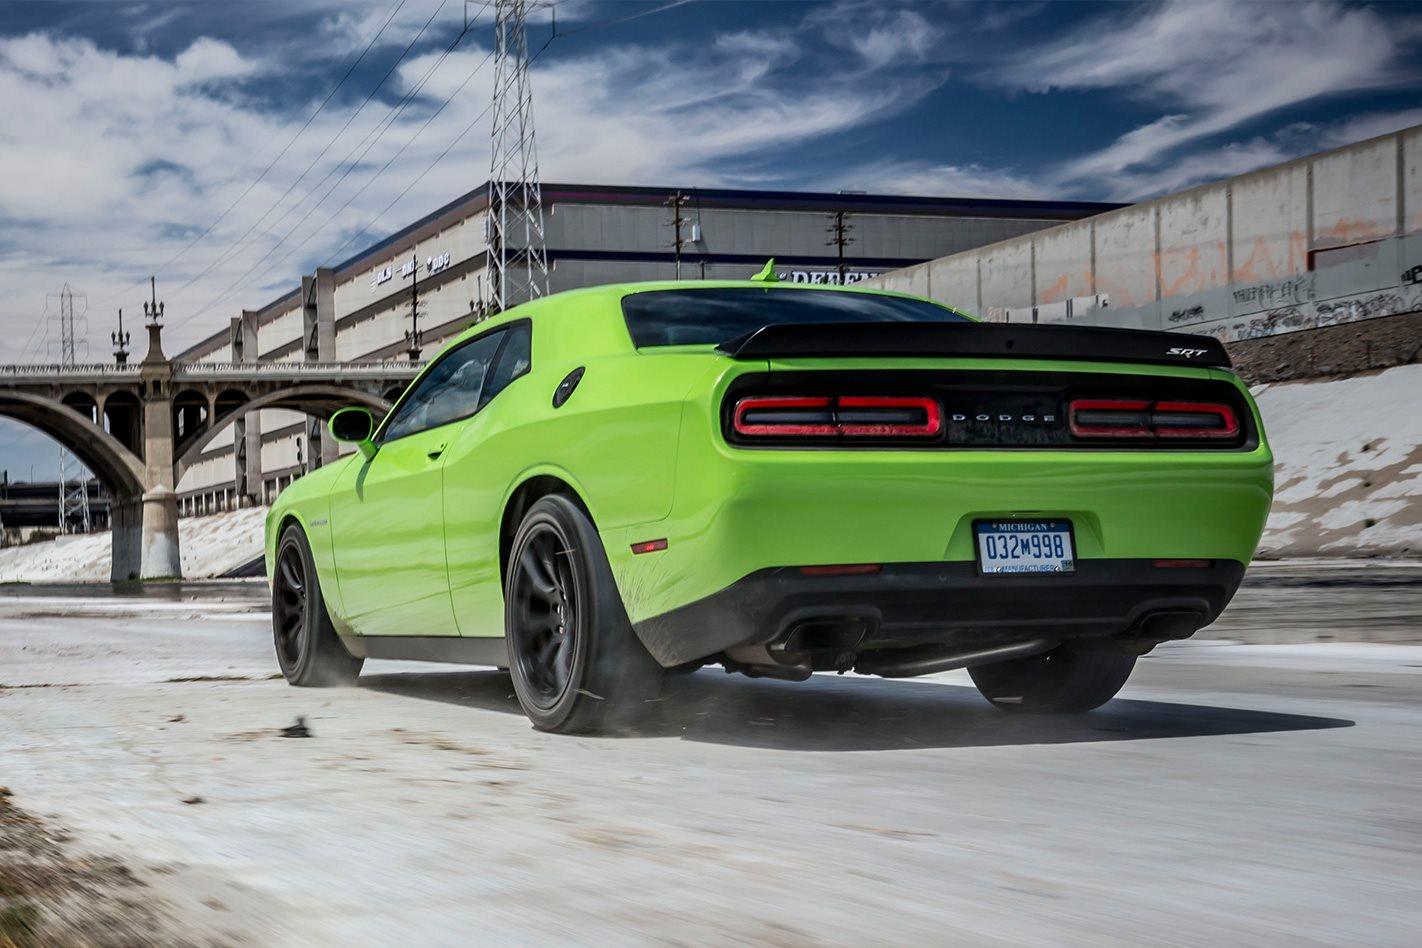 2018 dodge australia.  Australia Dodge Challenger Hellcat Available In Australia Throughout 2018 Dodge Australia L